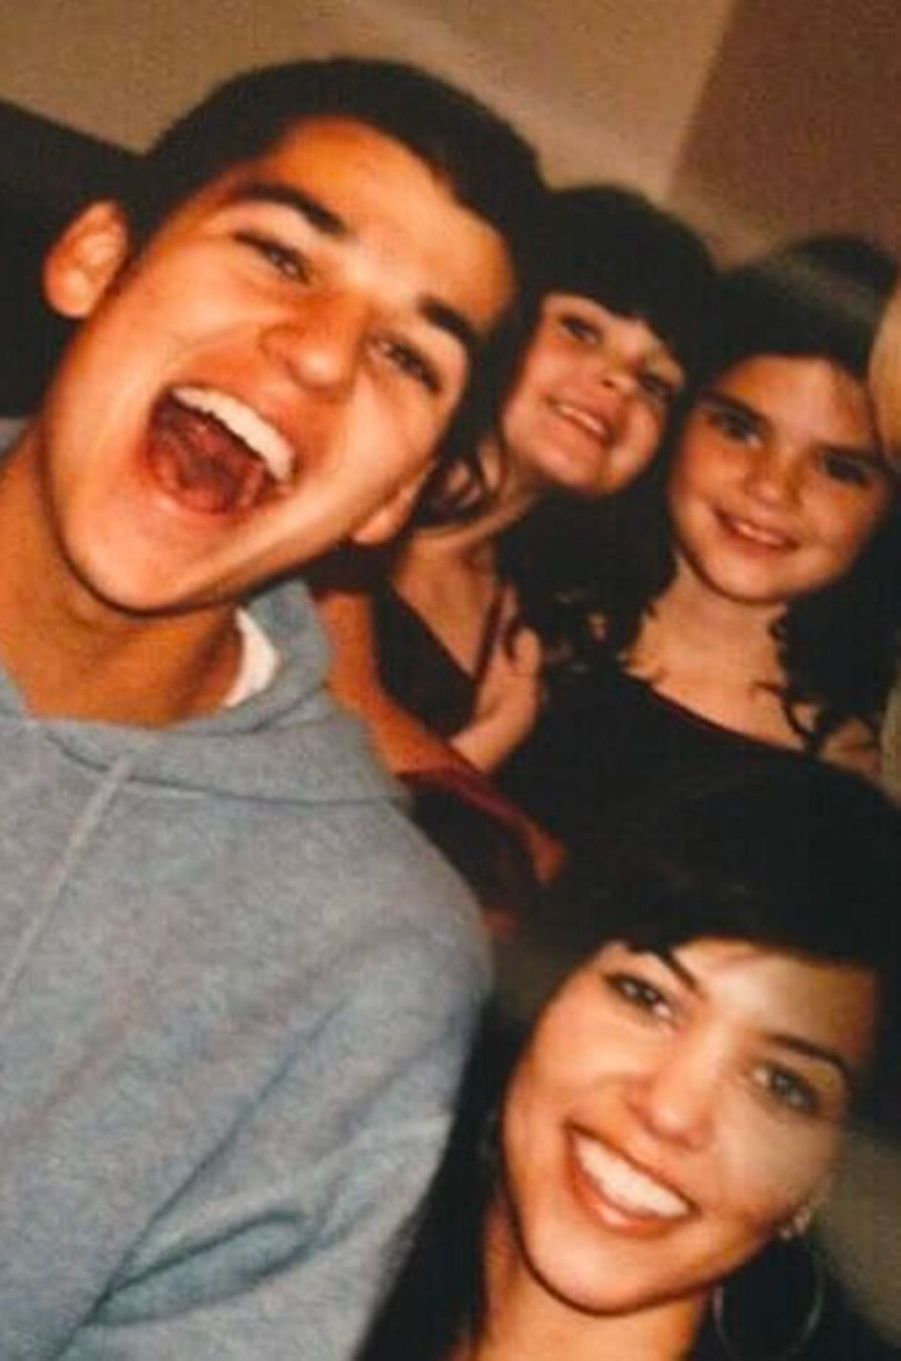 Kendall Jenner avec ses soeurs Kylie Jenner et Kourtney Kardashian et son frère Rob Kardashian